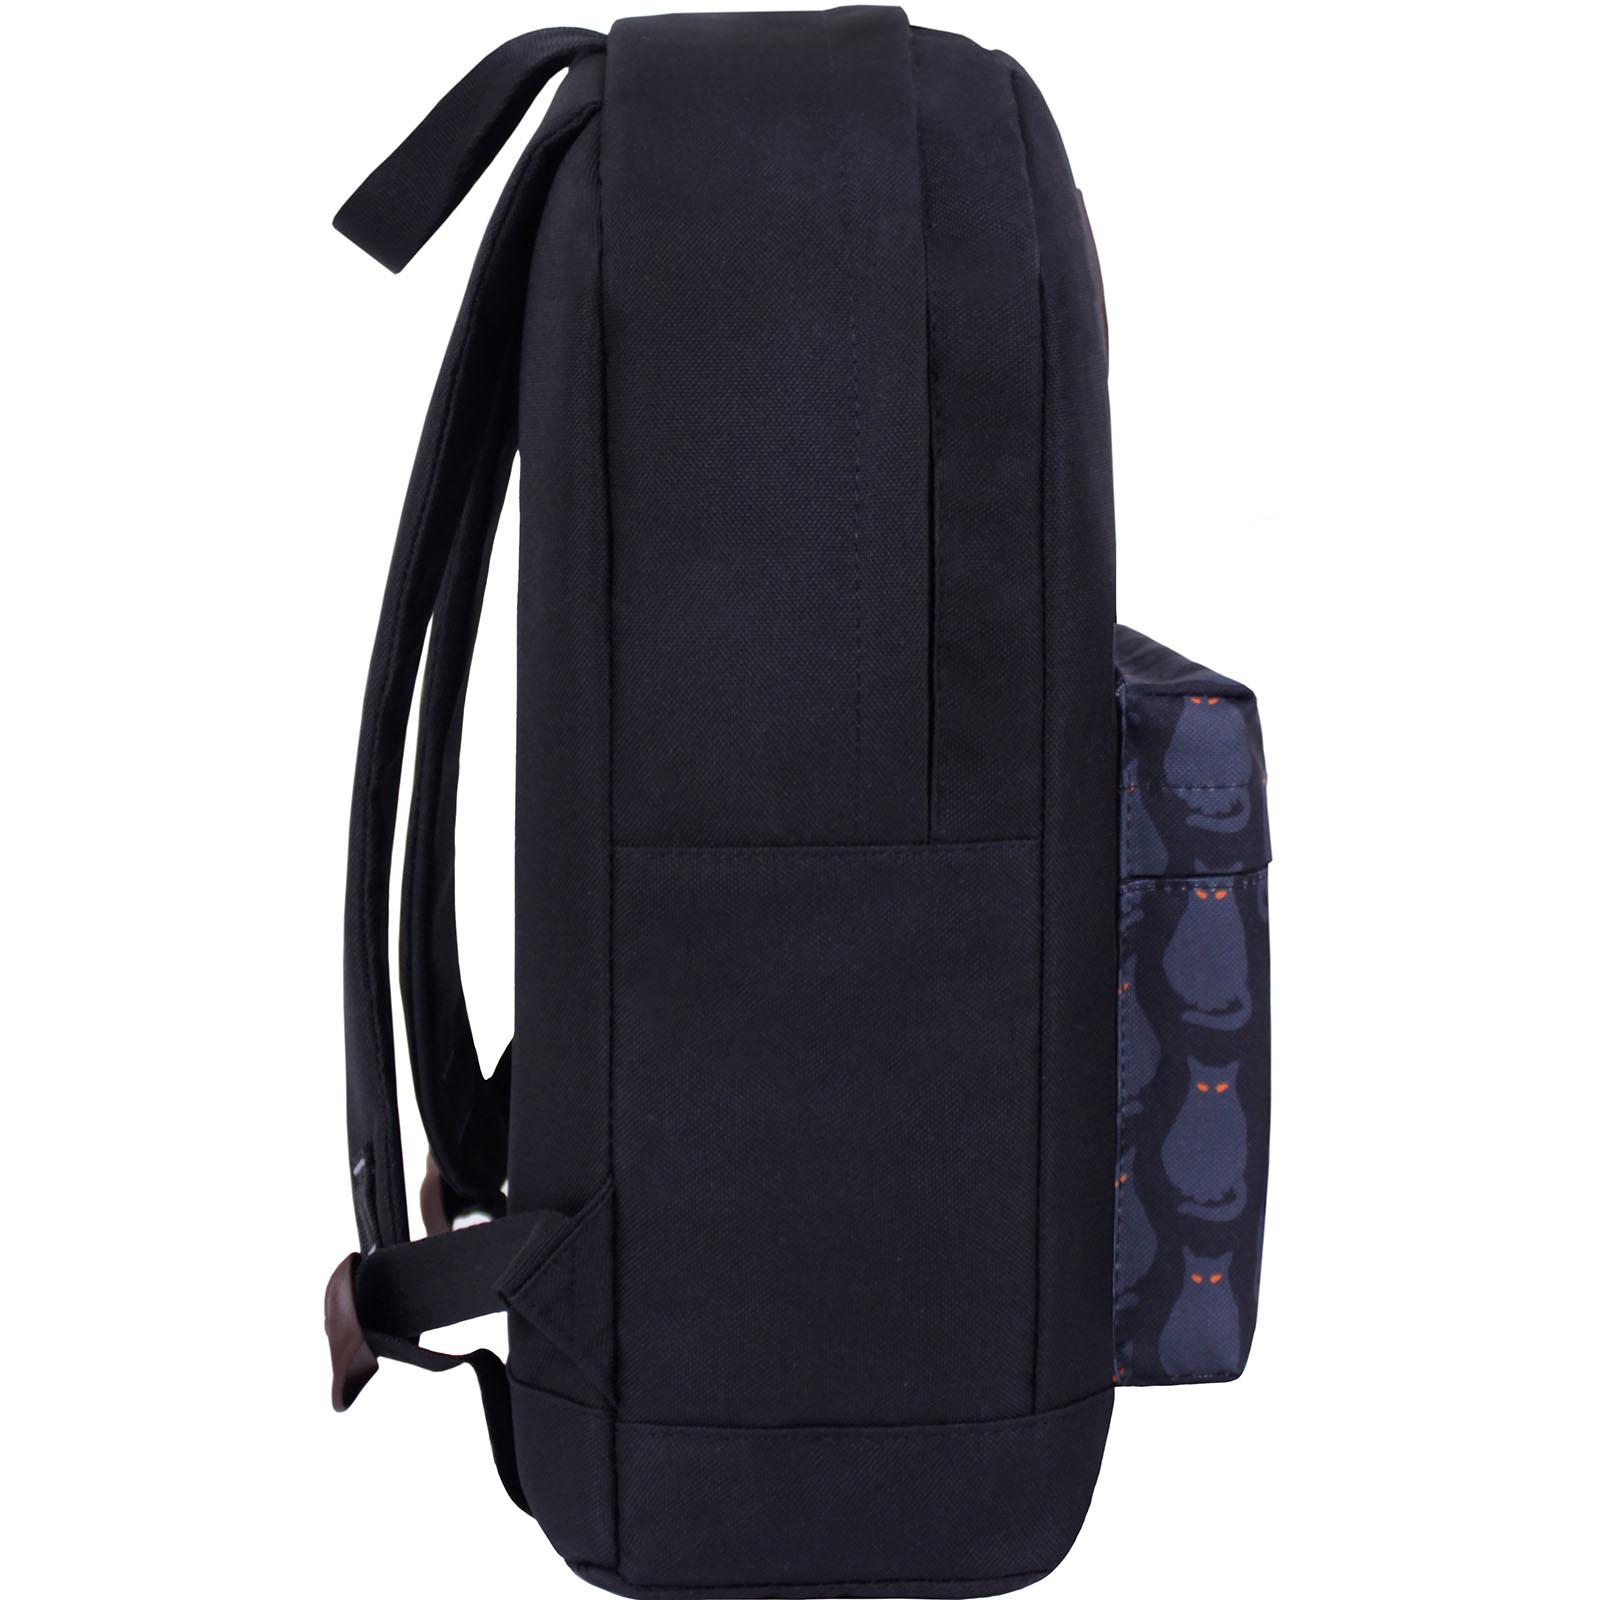 Рюкзак Bagland Молодежный W/R 17 л. чорний 193 (00533662) фото 2